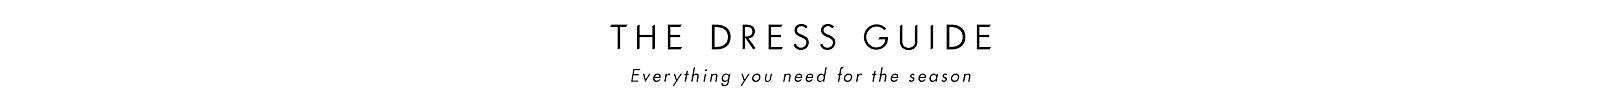 Dress Guide